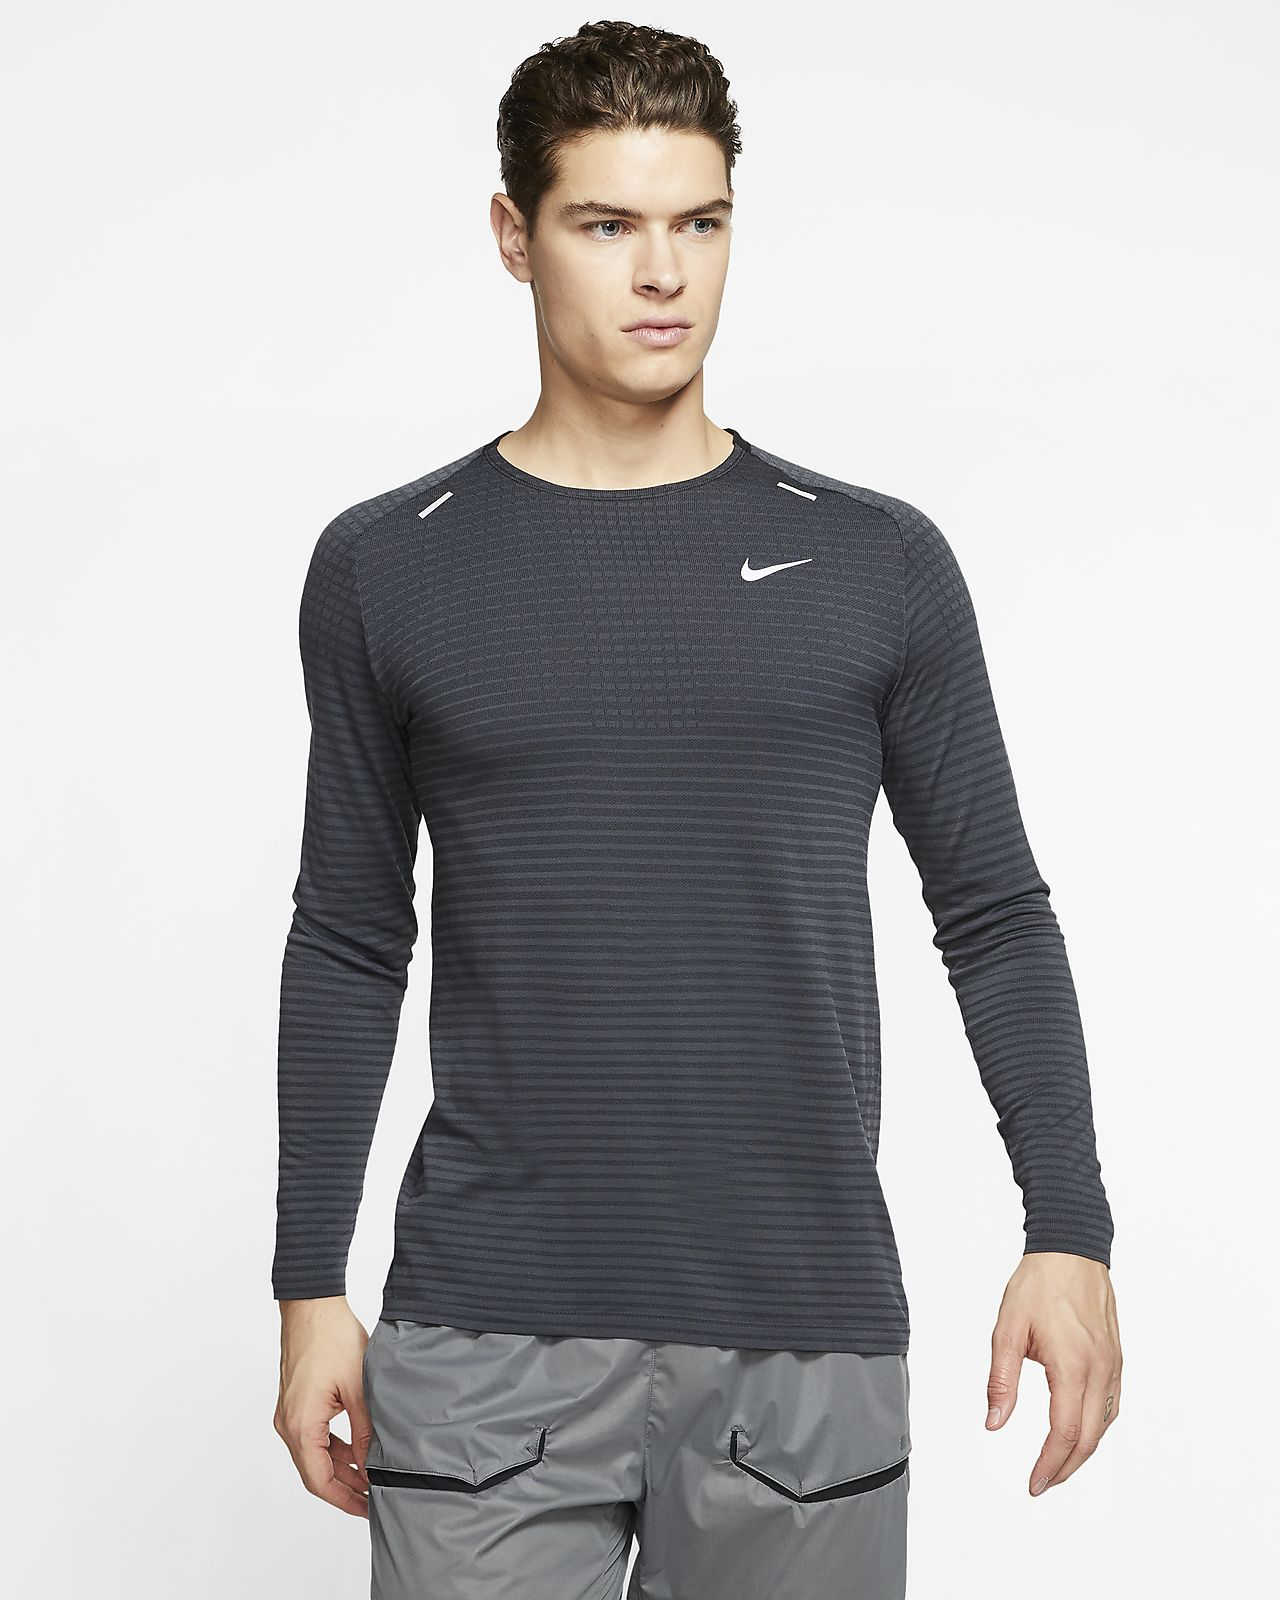 Nike TechKnit Ultra hosszú ujjú férfi futófelső